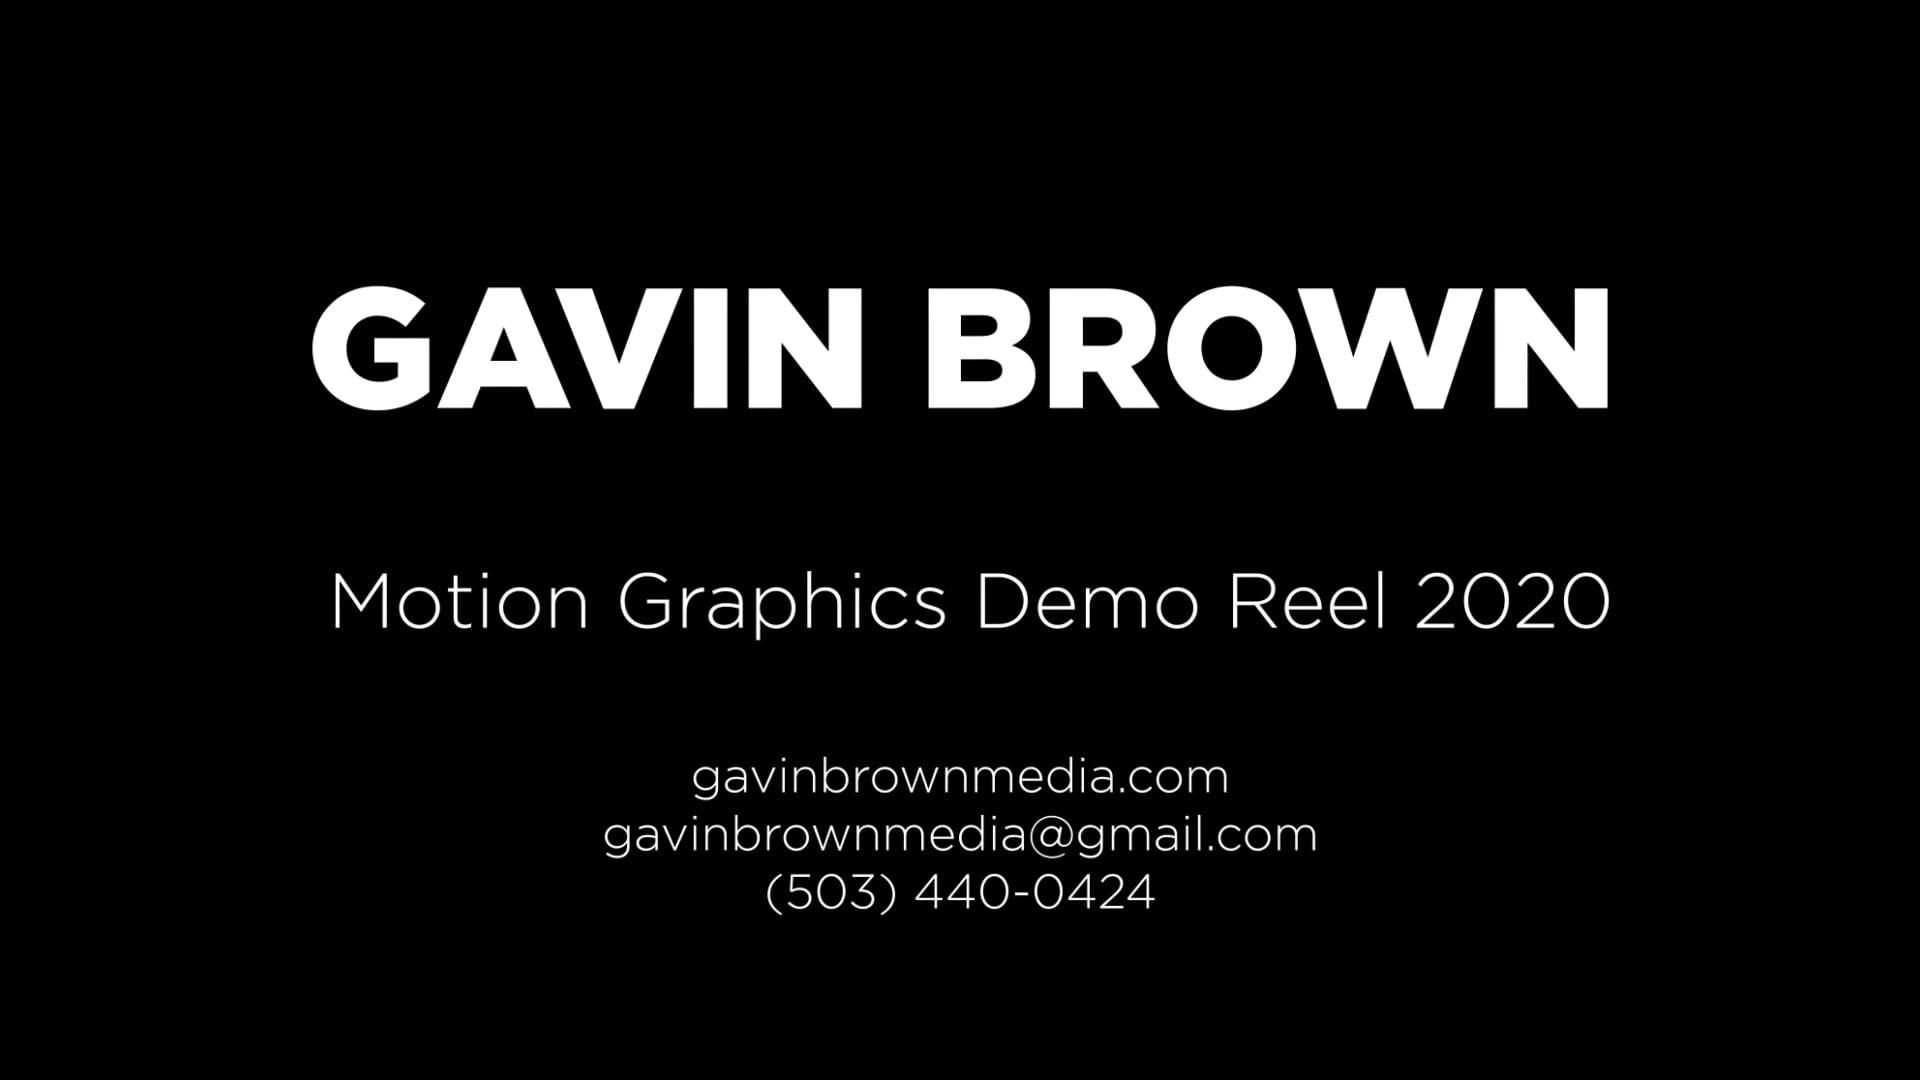 Motion Graphics Demo Reel 2020